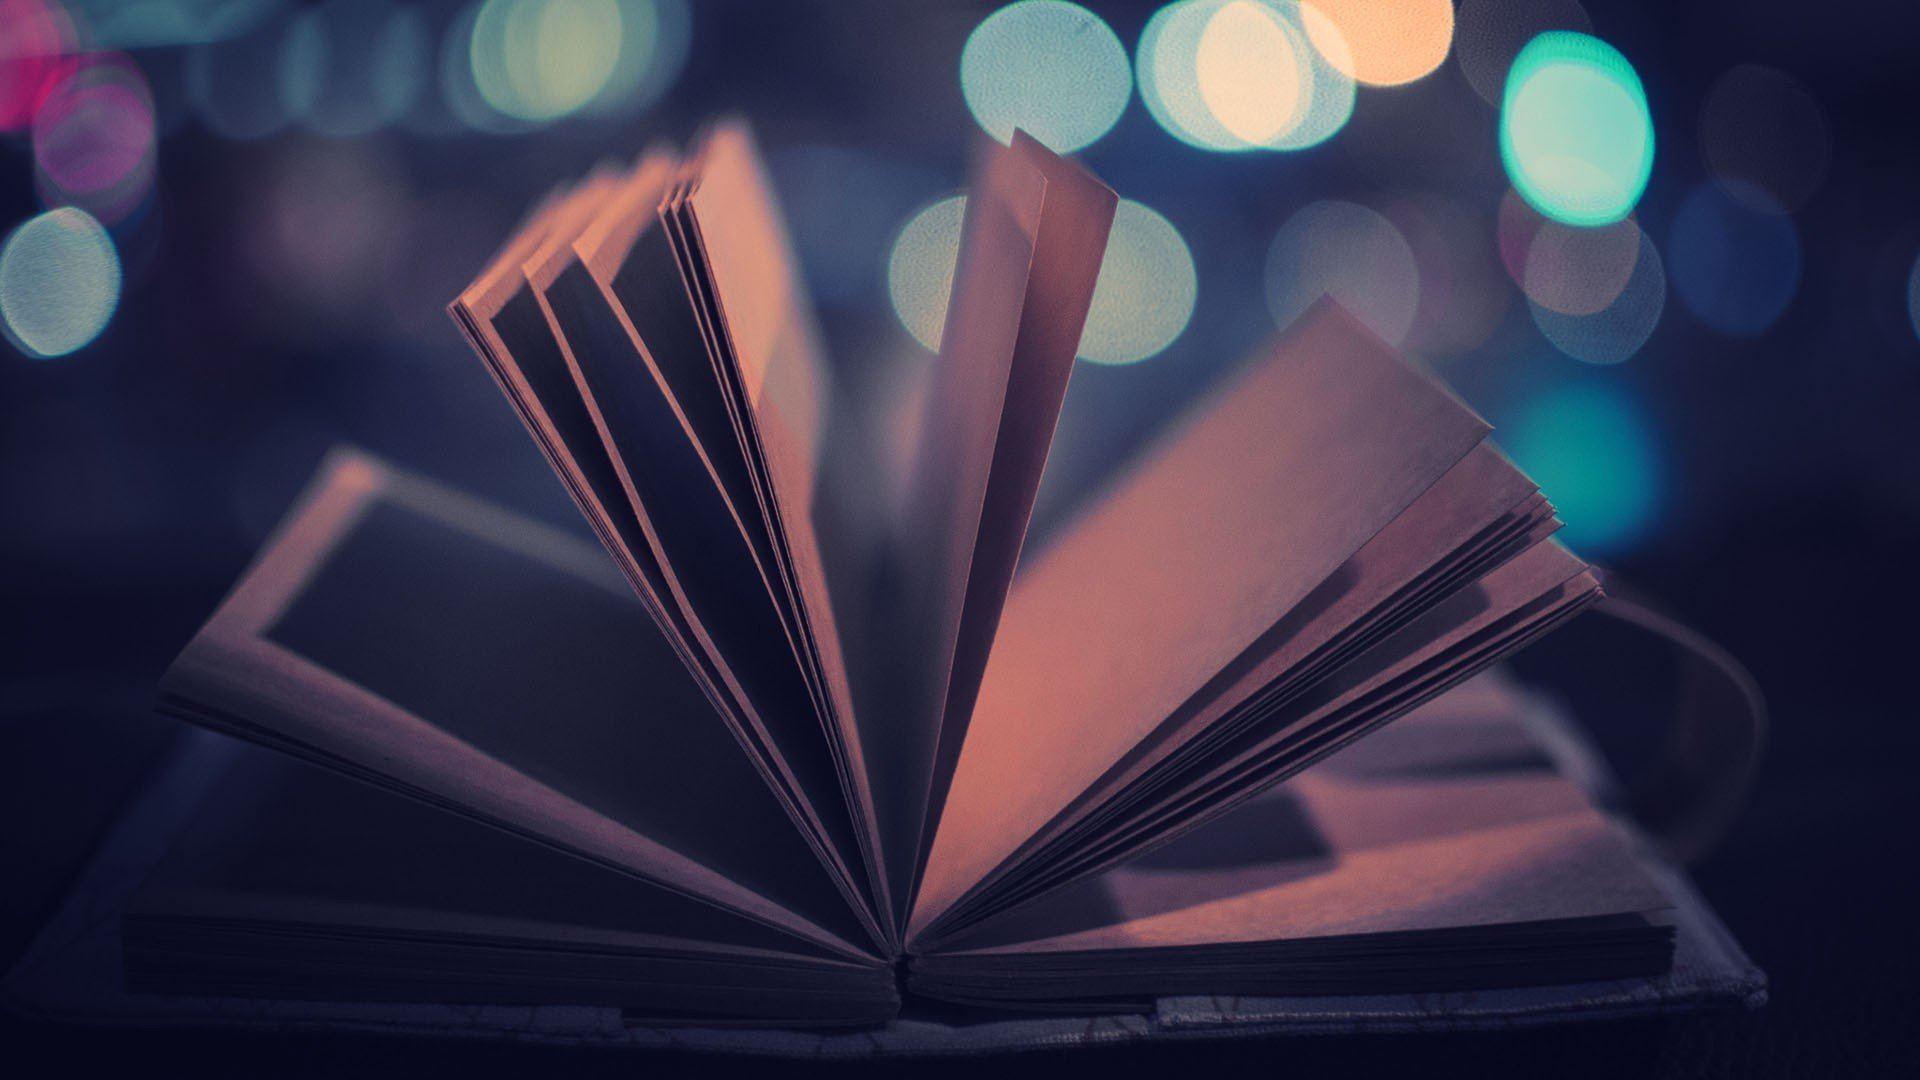 Dream Journal opening